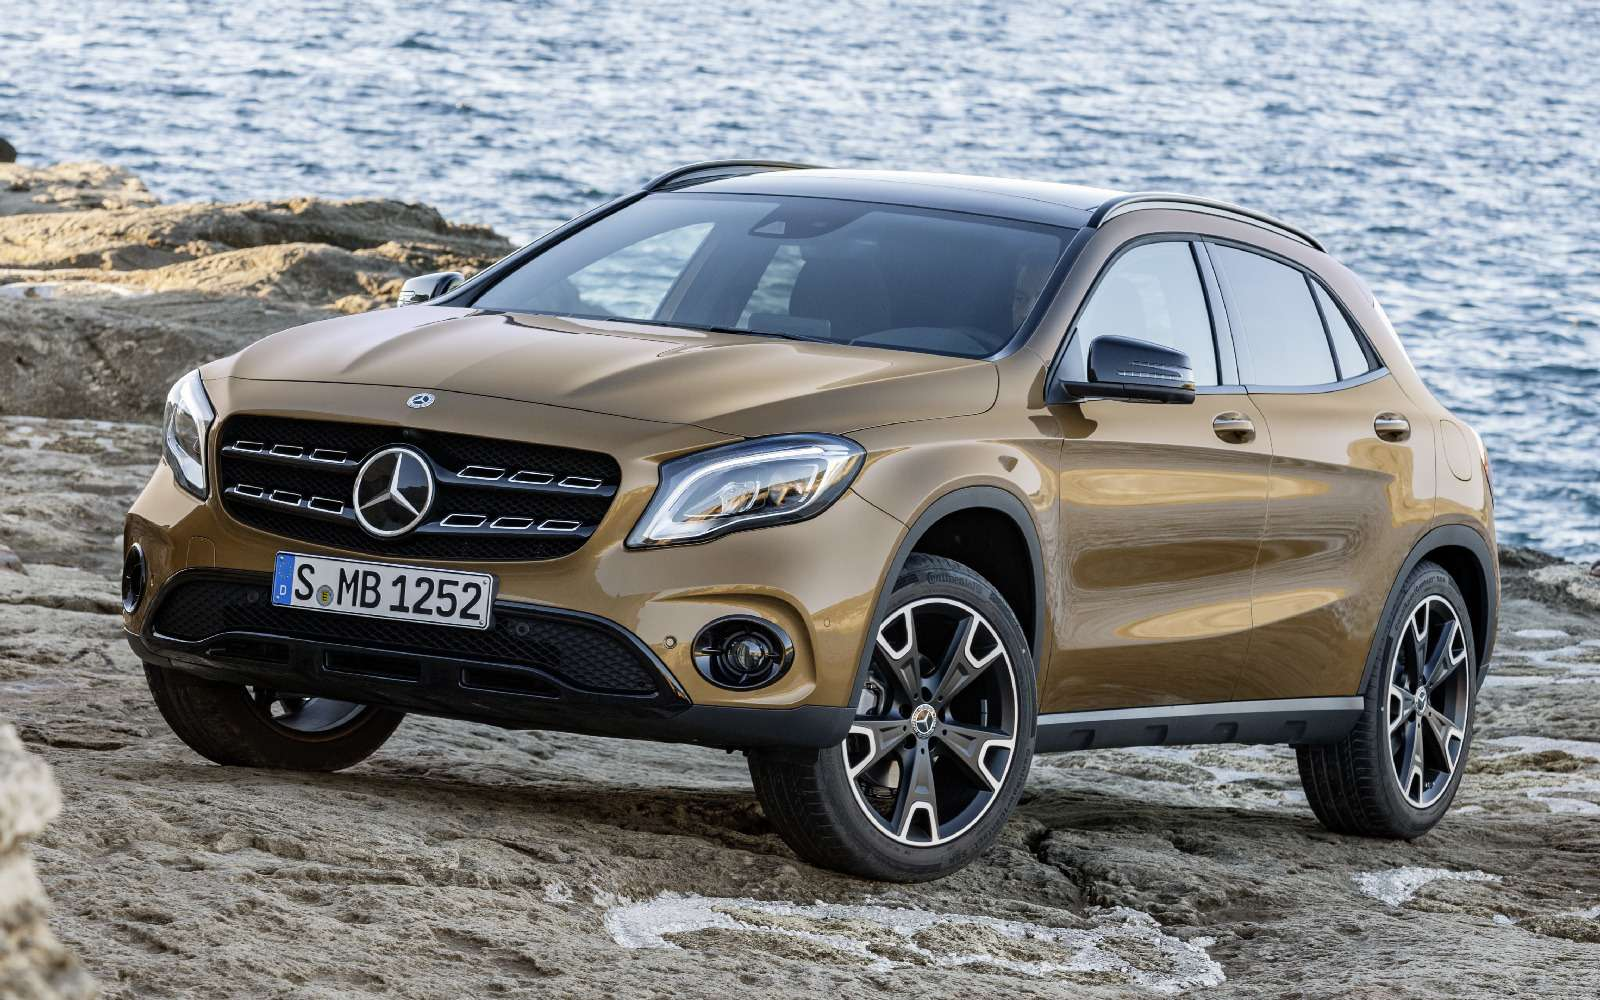 Mercedes-Benz GLA стал краше, ноне просторнее— фото 690075